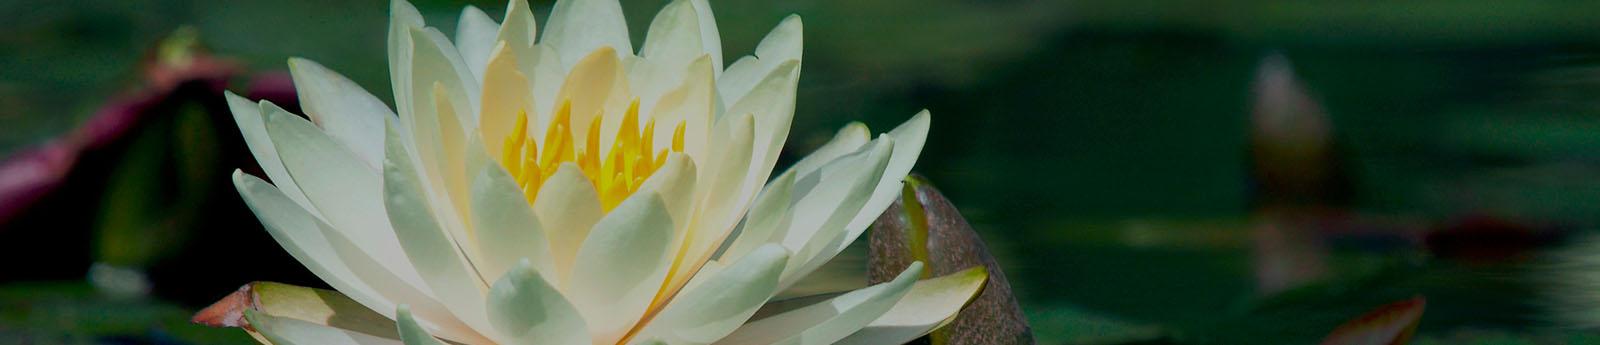 Resources | McKoon Funeral Home & Crematory